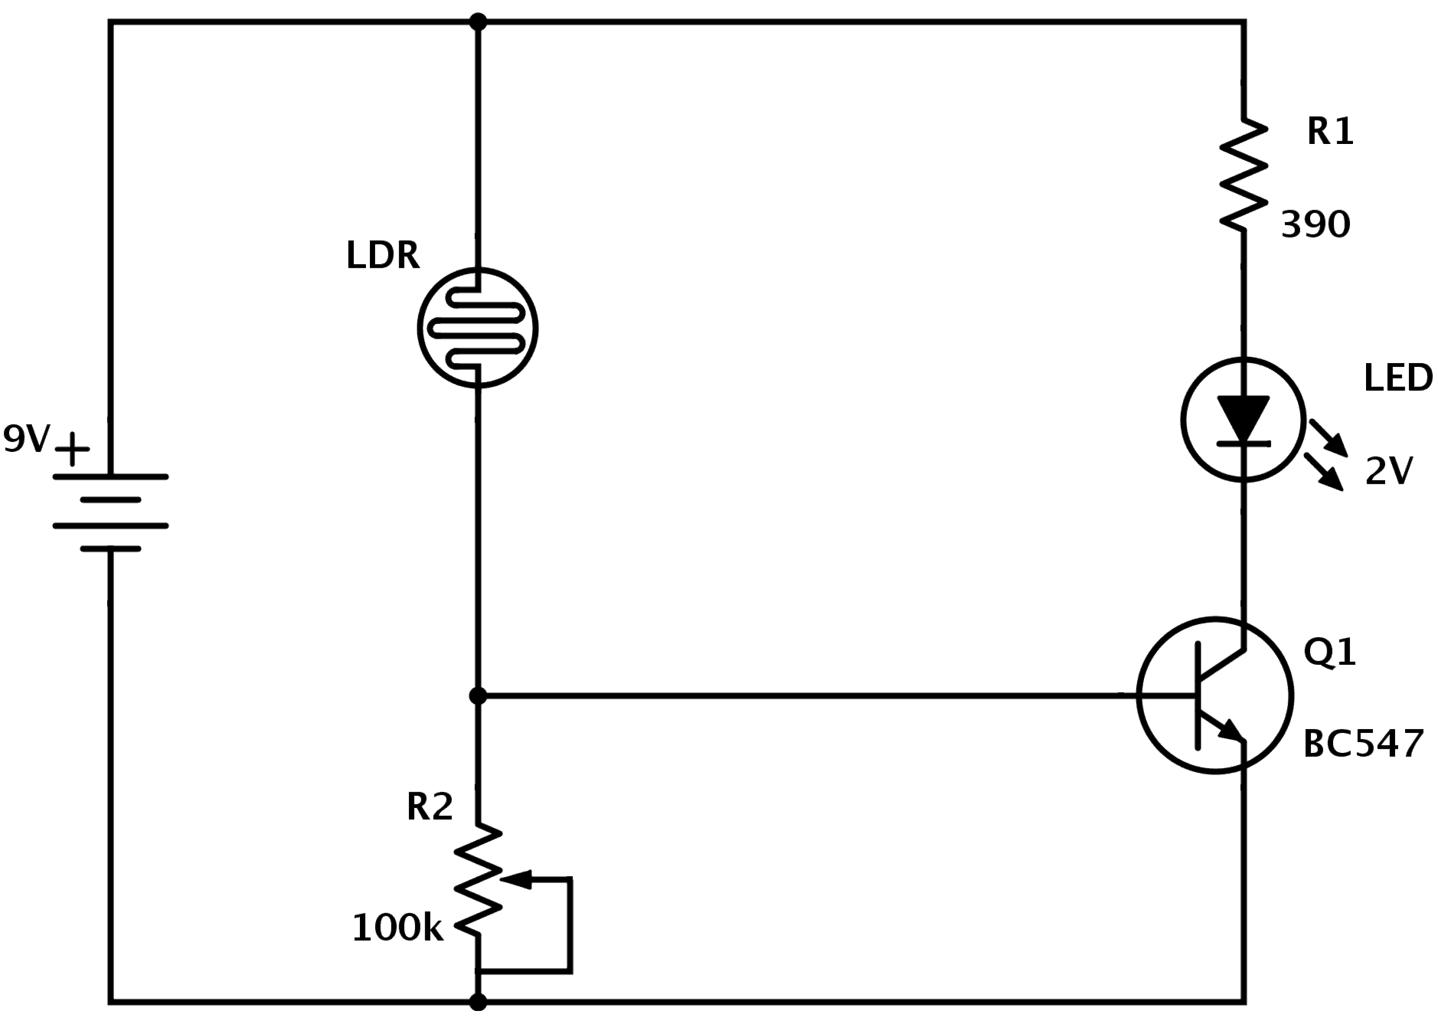 application of light sensor circuit